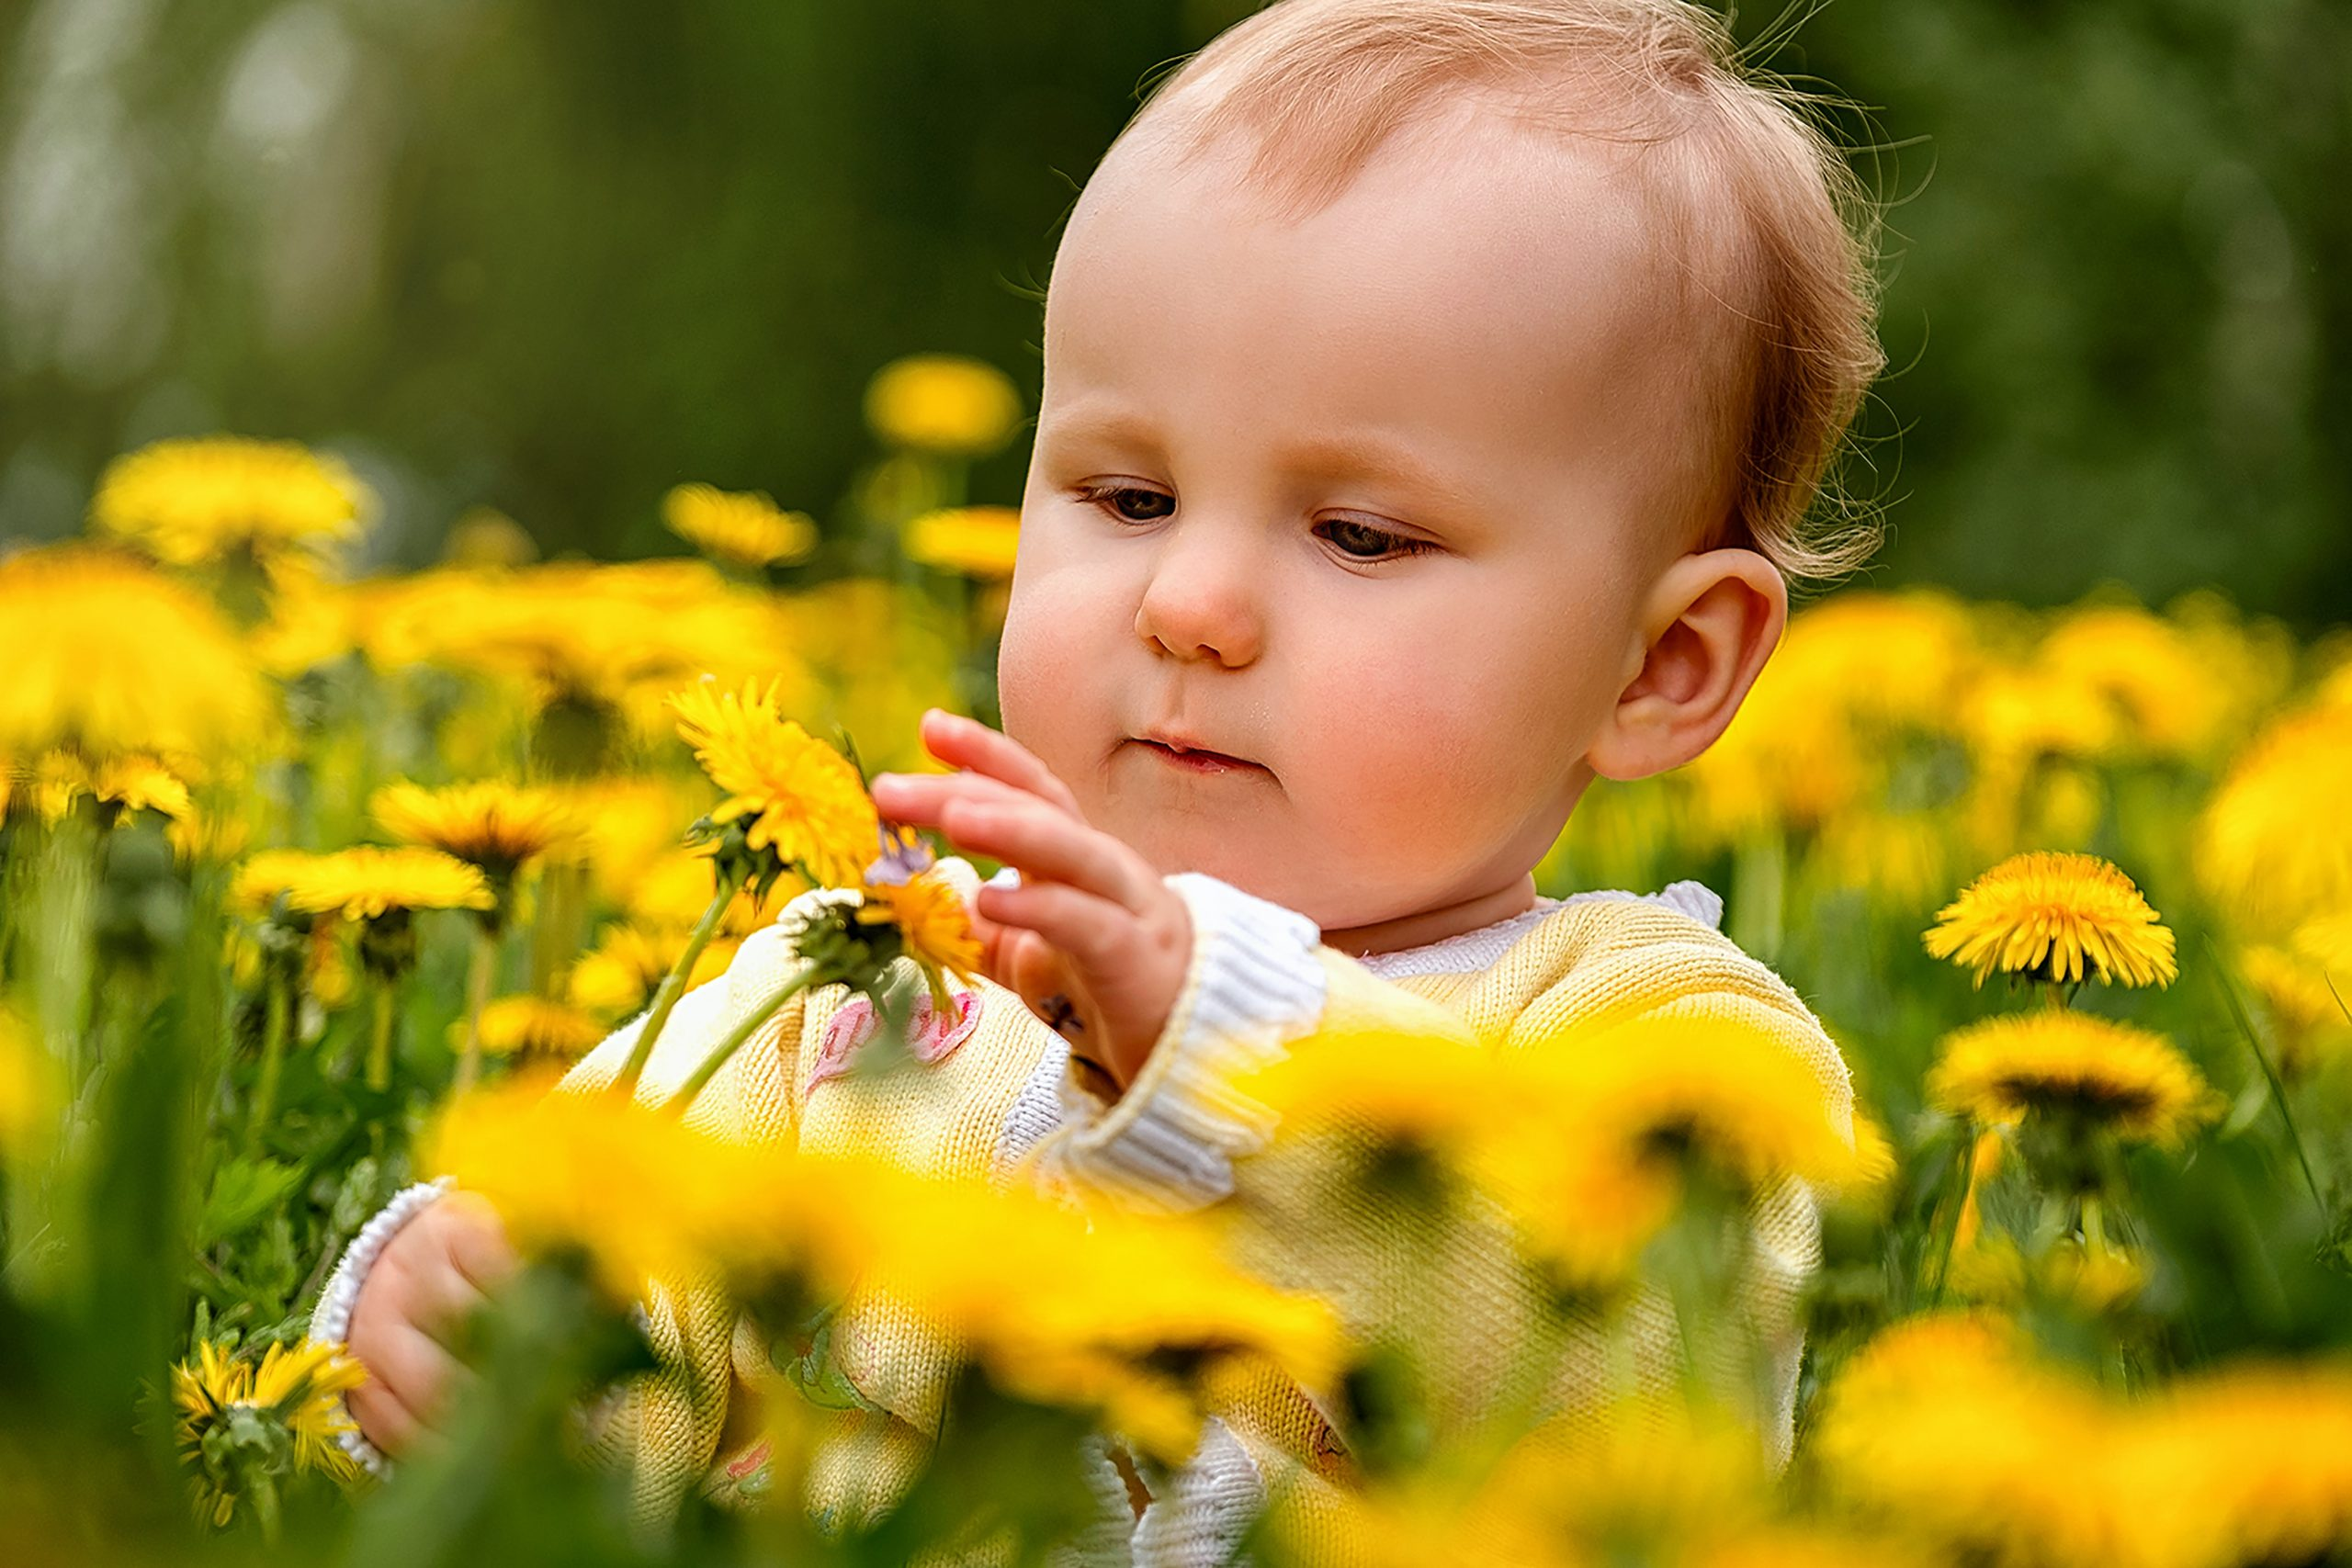 Sensory awareness activities for children as discussed by Dr. Marisa van Niekerk Educational Psychologist